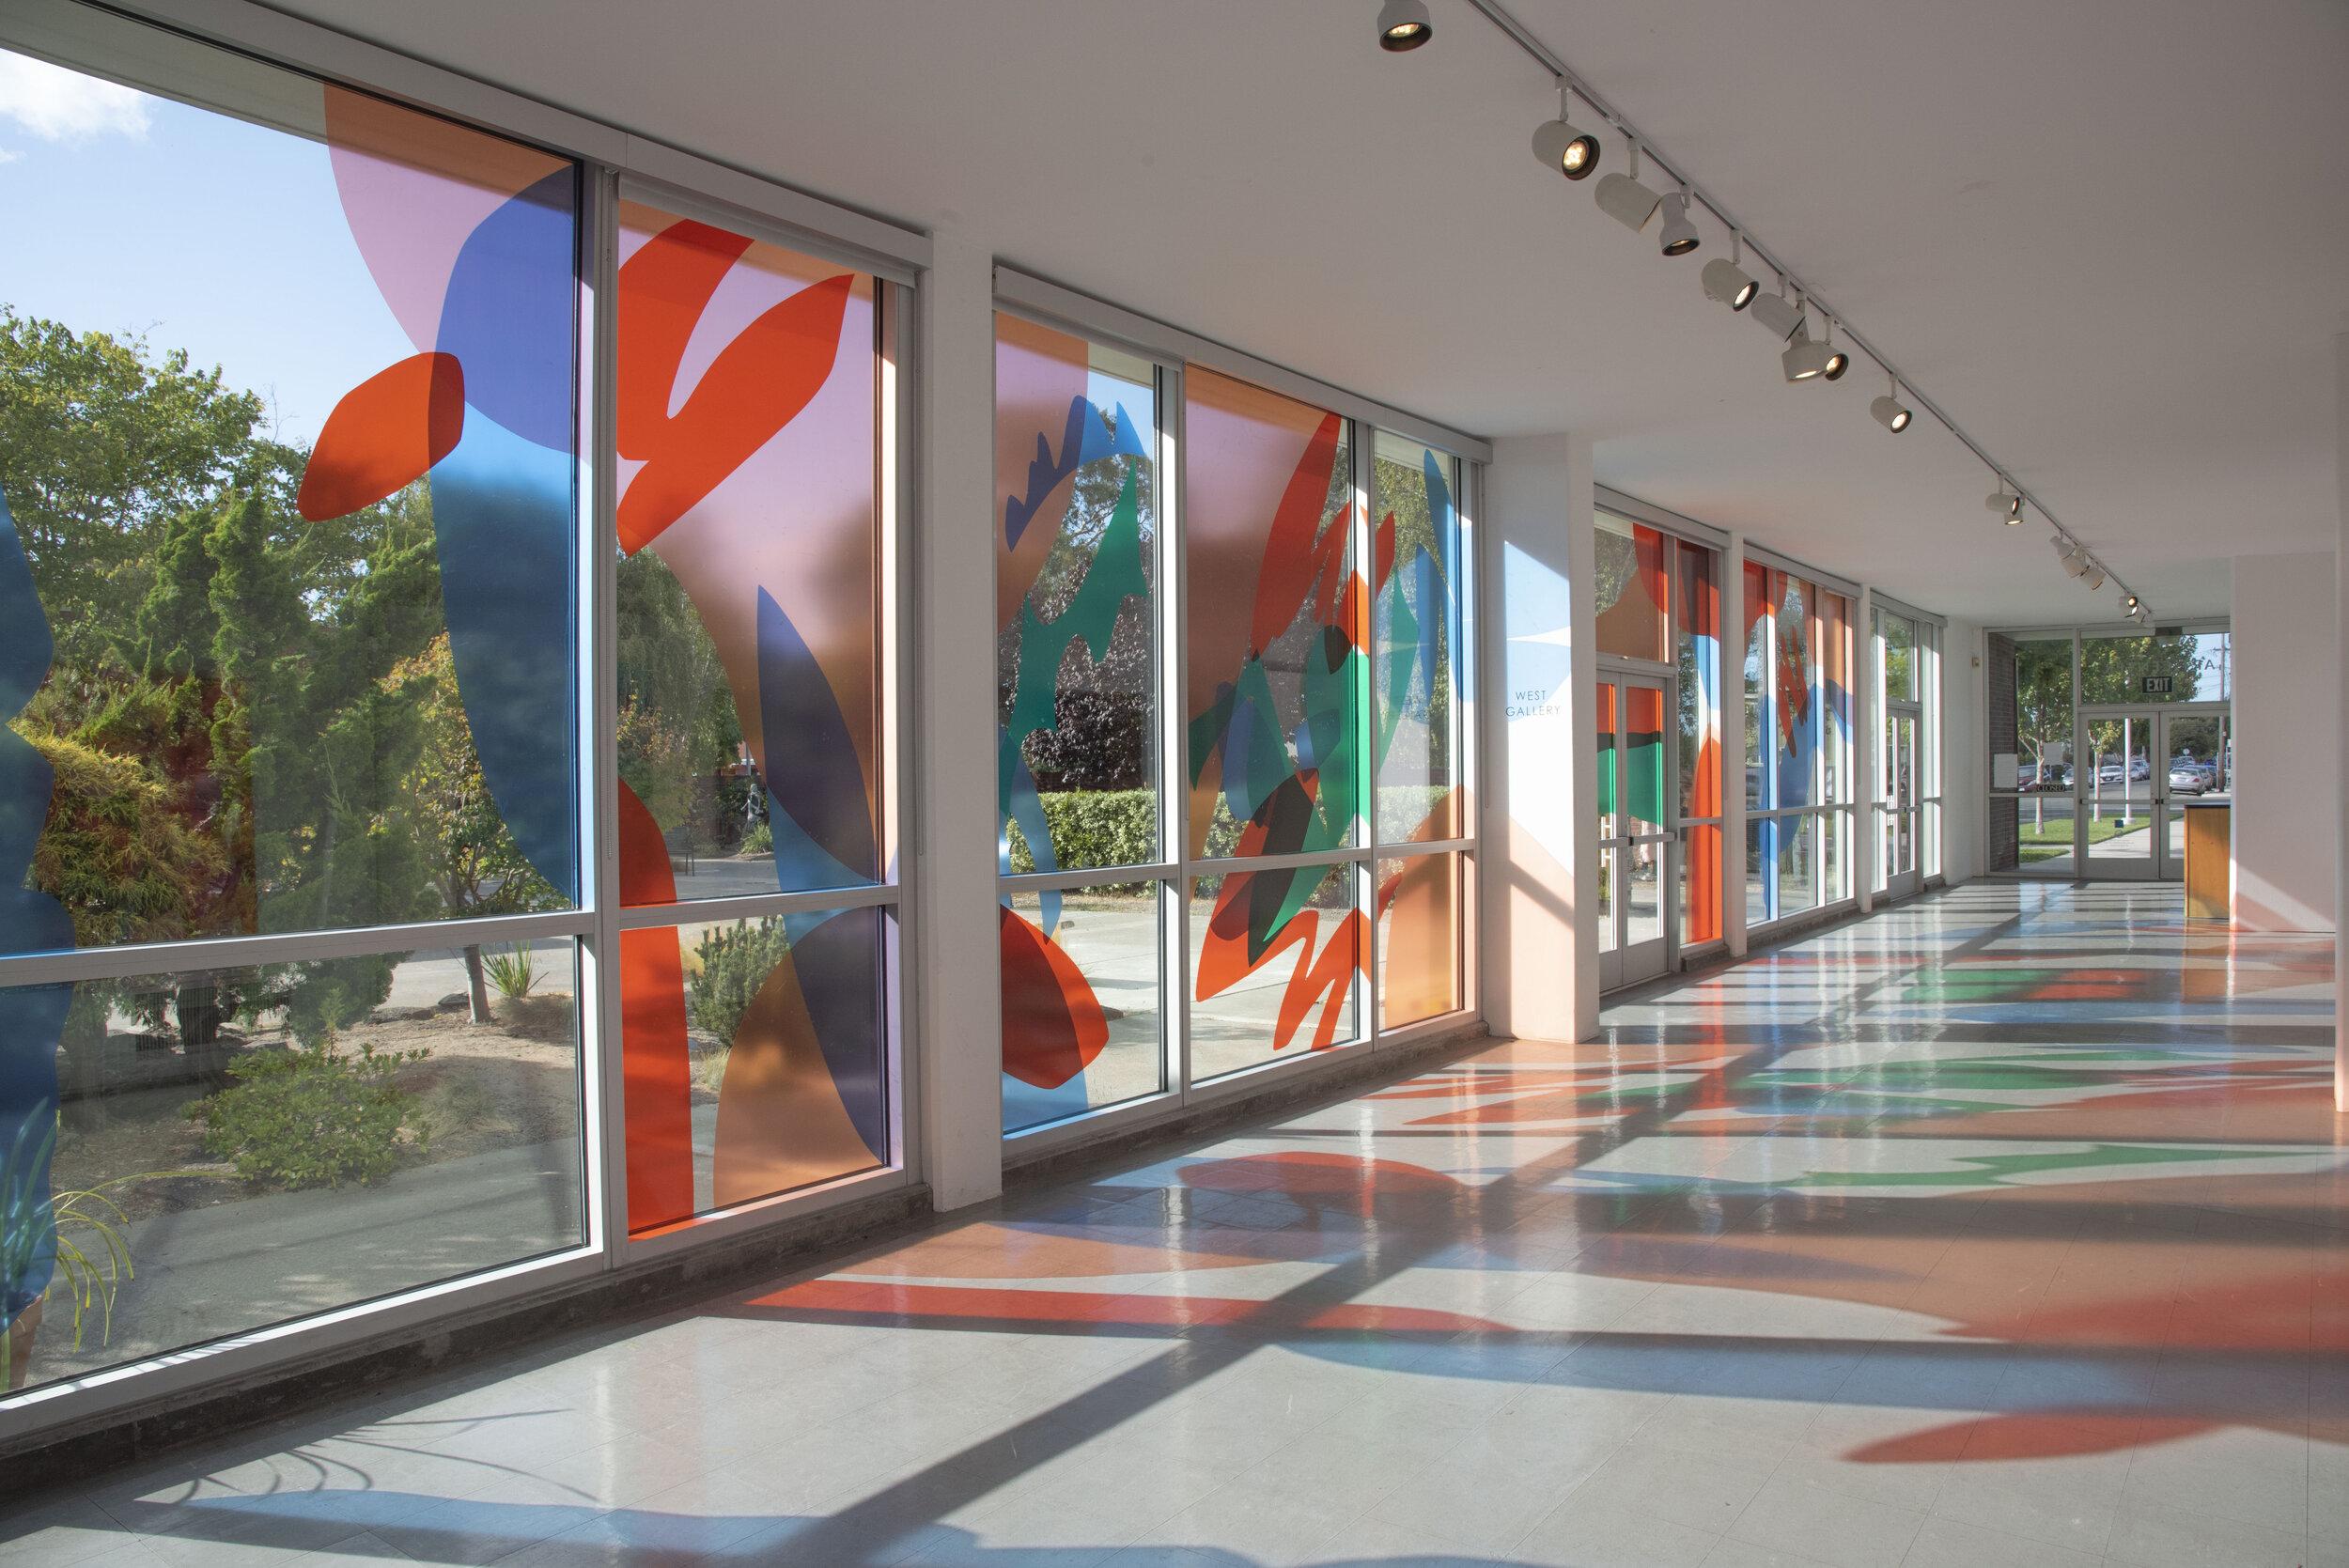 Thresholds,  10 x 38 ft., Transparent vinyl over window, 2019